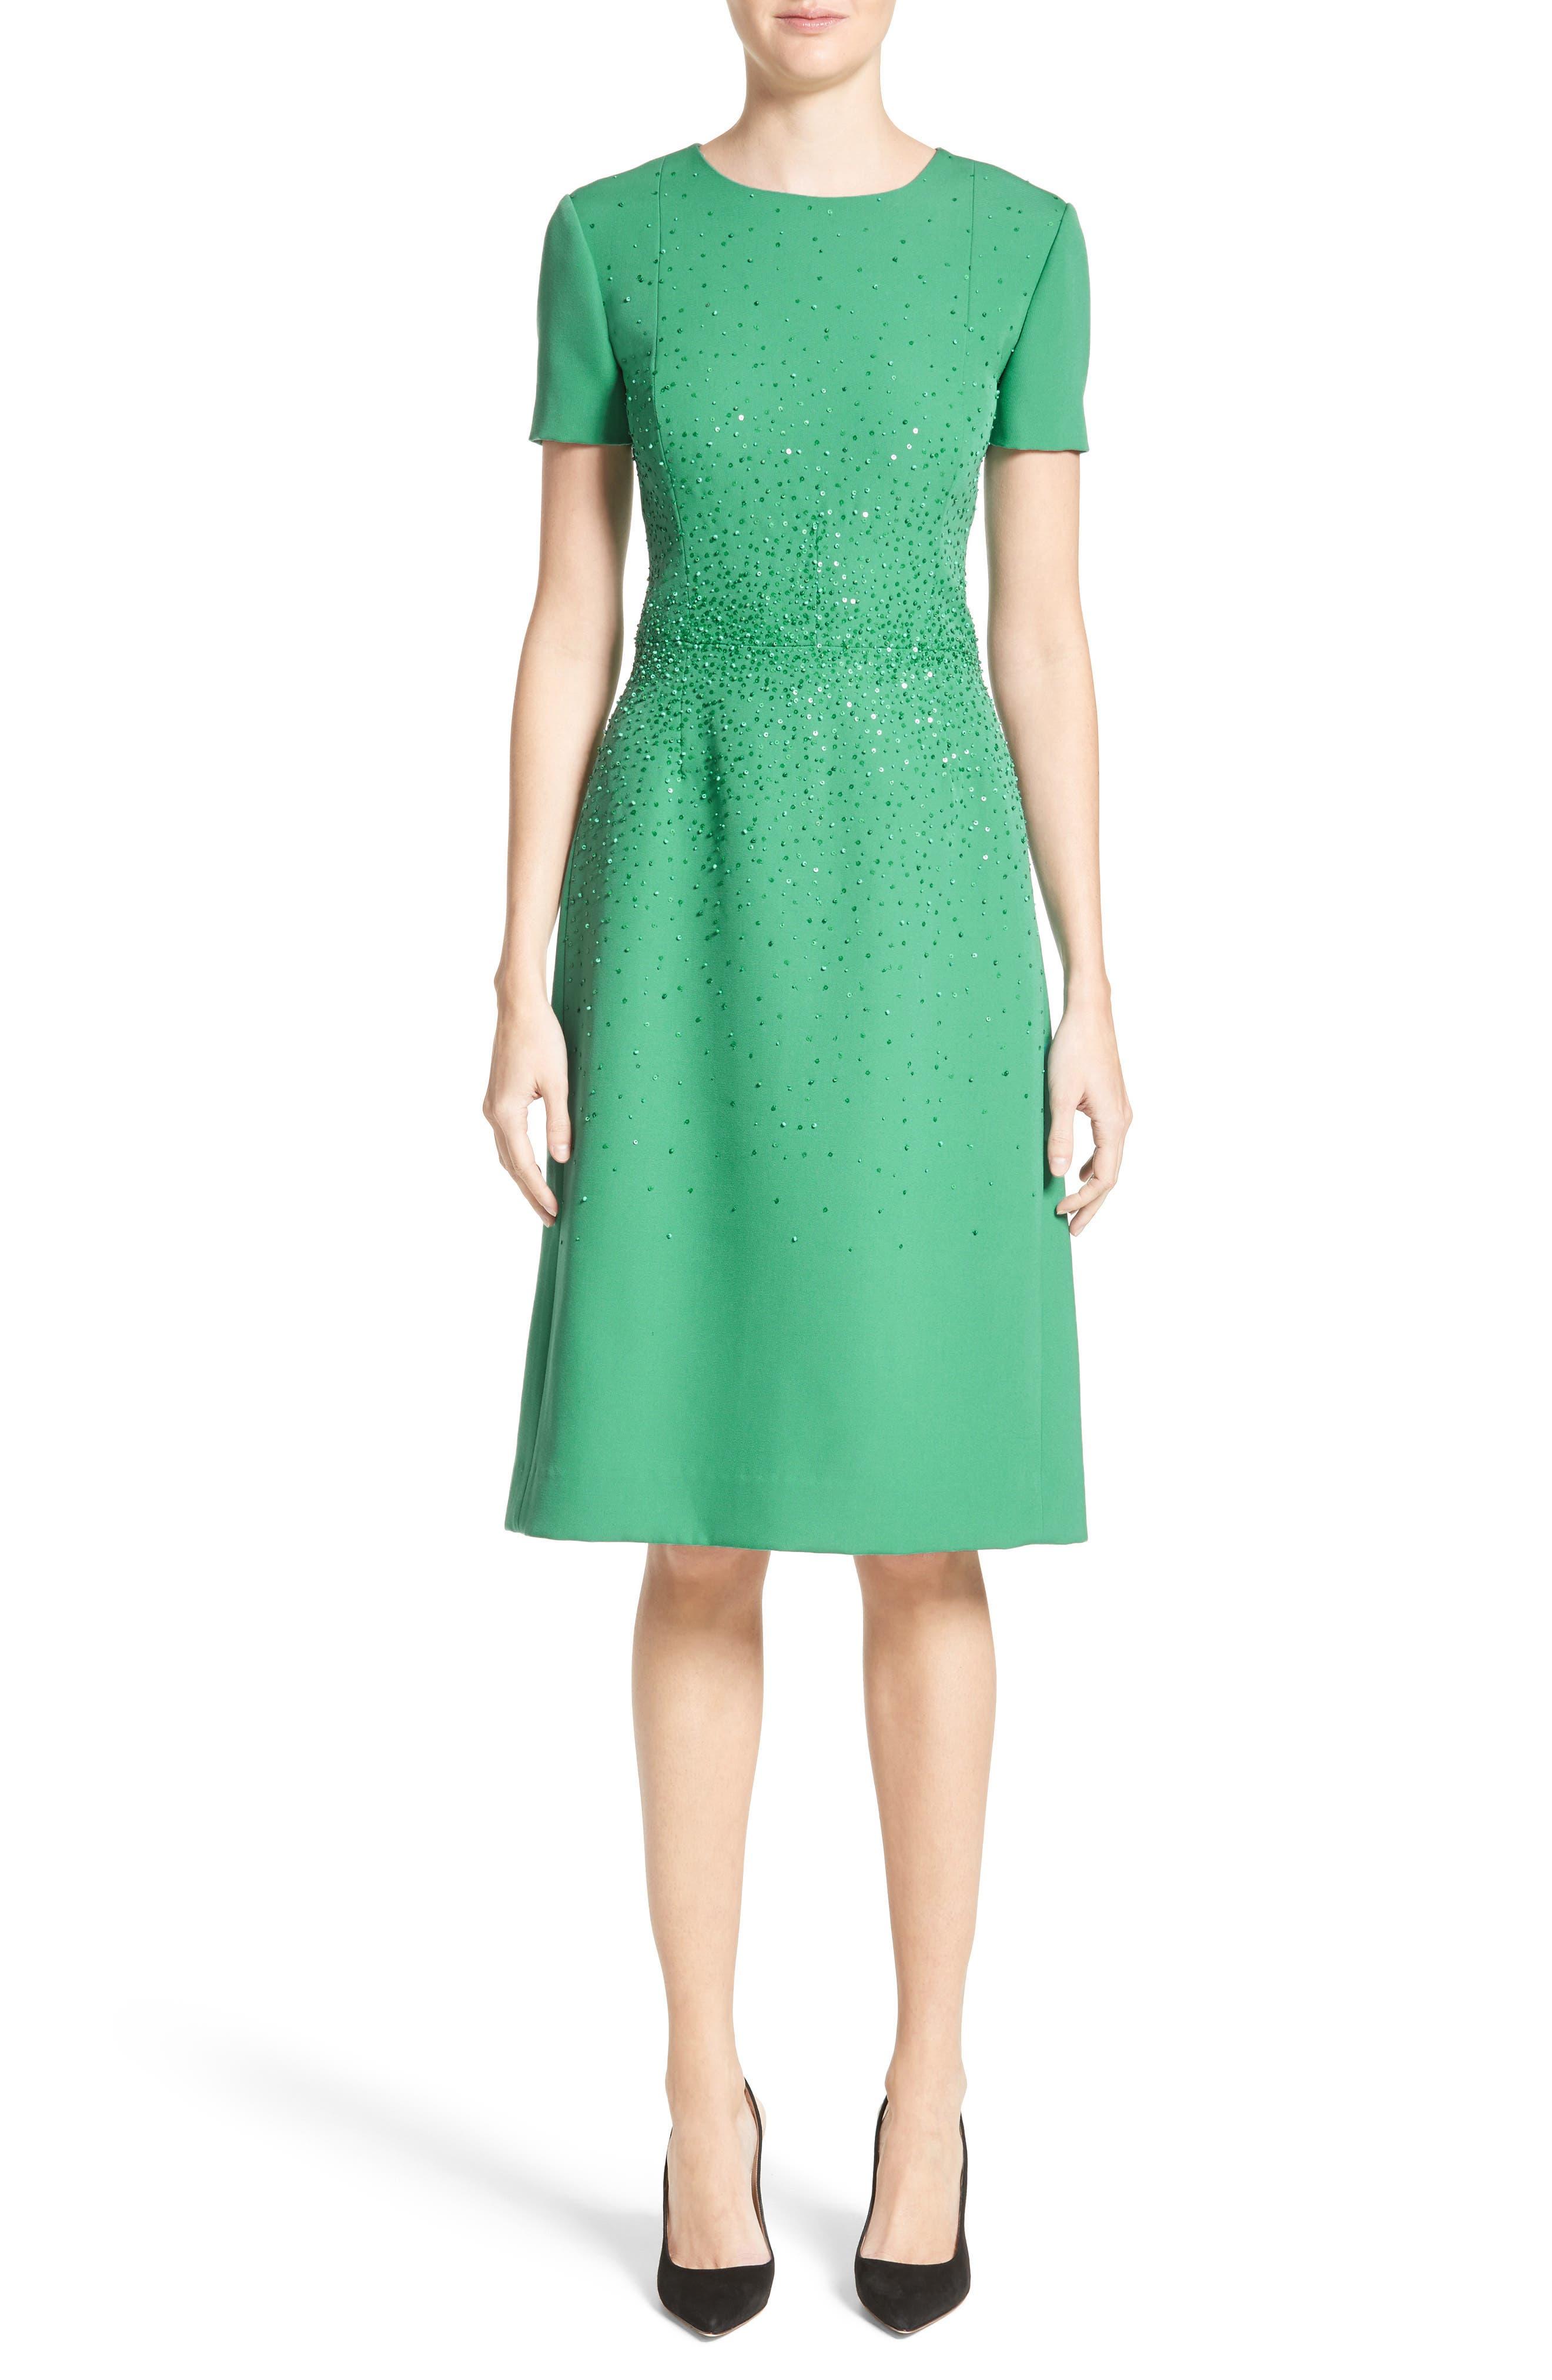 Alternate Image 1 Selected - Carolina Herrera Beaded Stretch Wool Dress